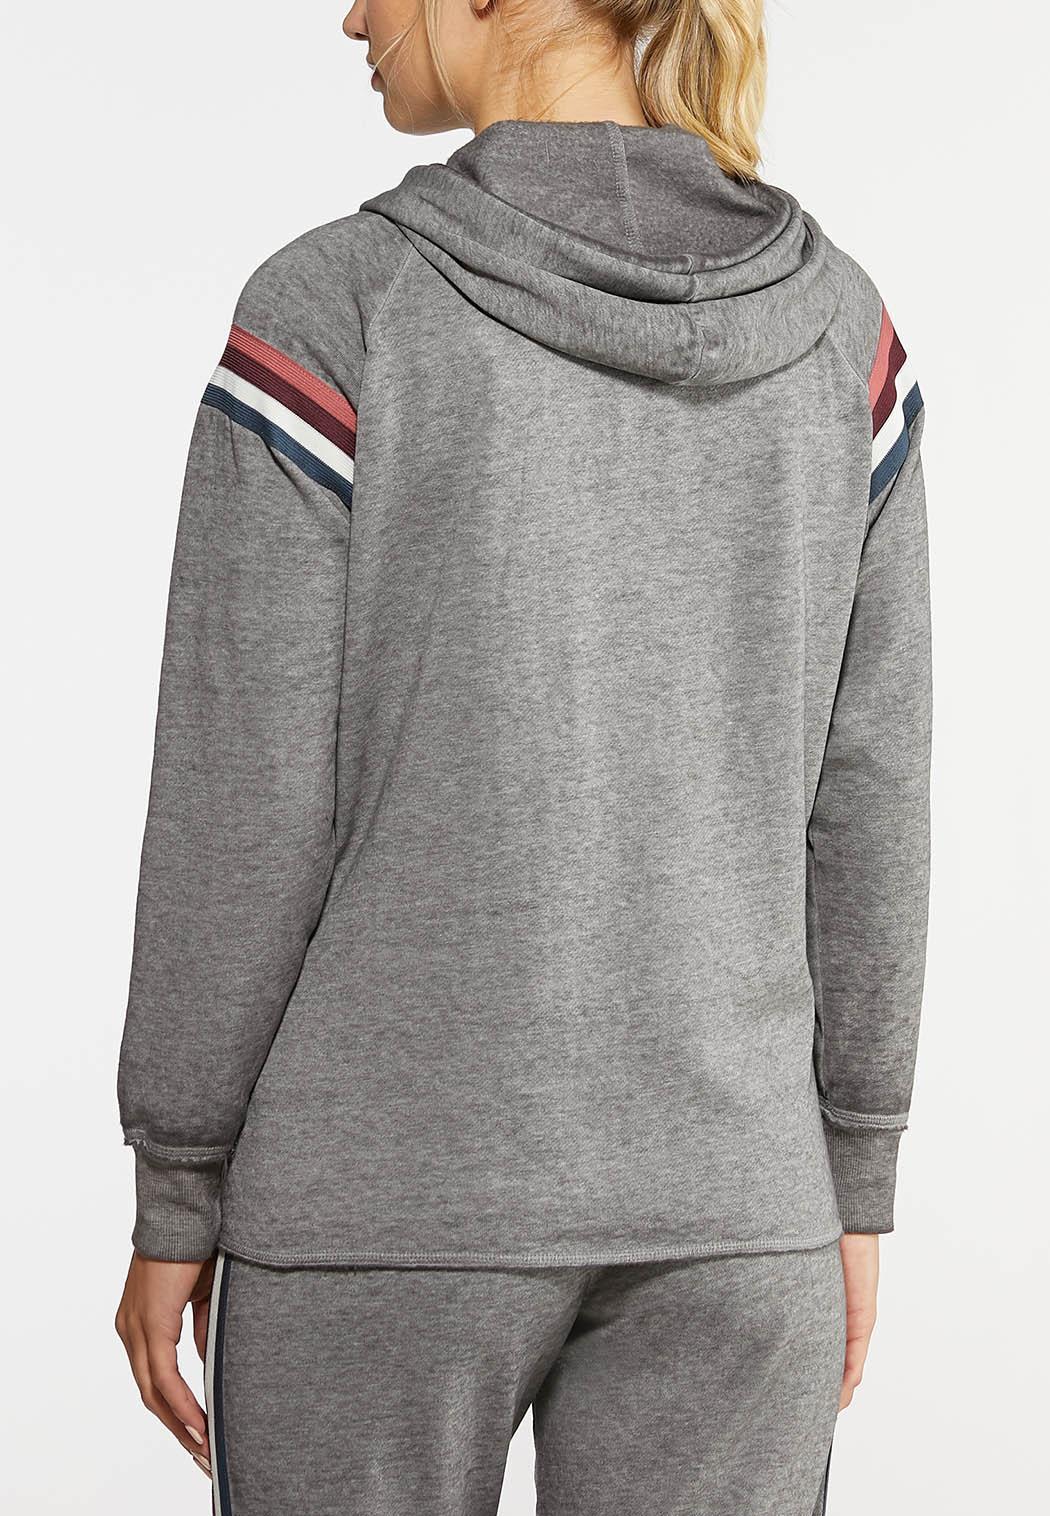 Plus Size Striped Fleece Hoodie (Item #43964684)